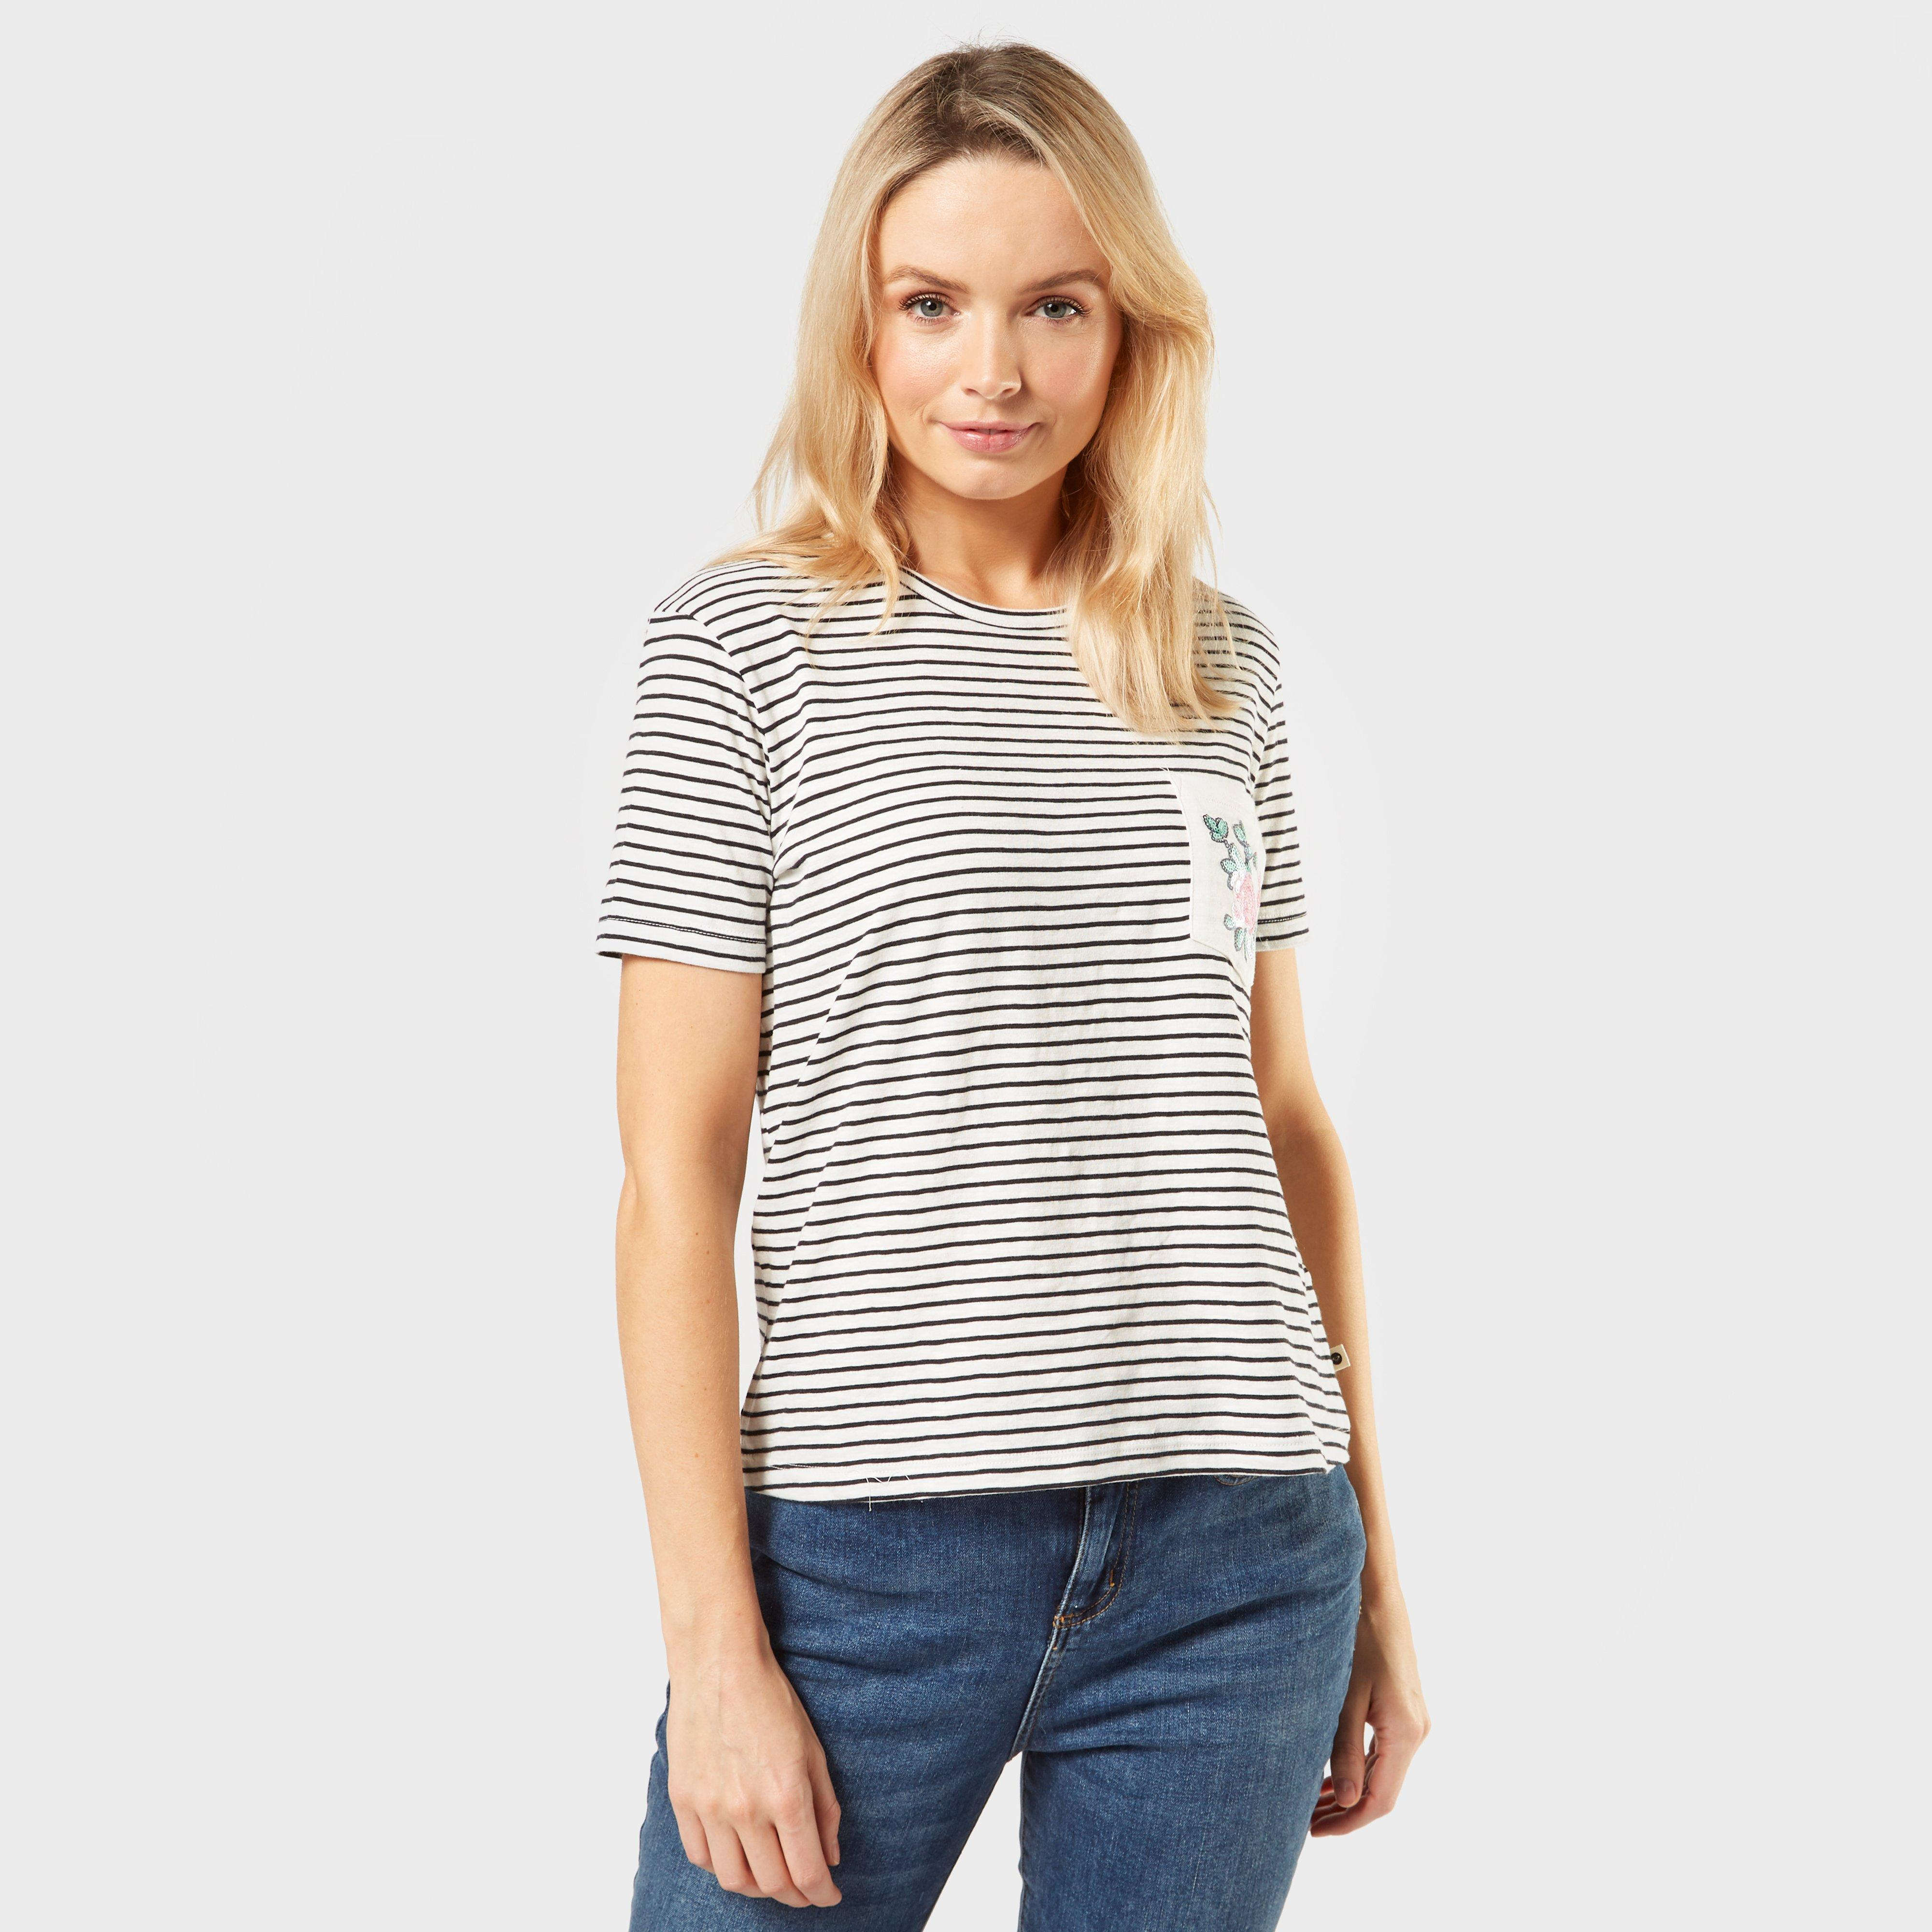 Roxy Women's Be My Love T-Shirt, Grey